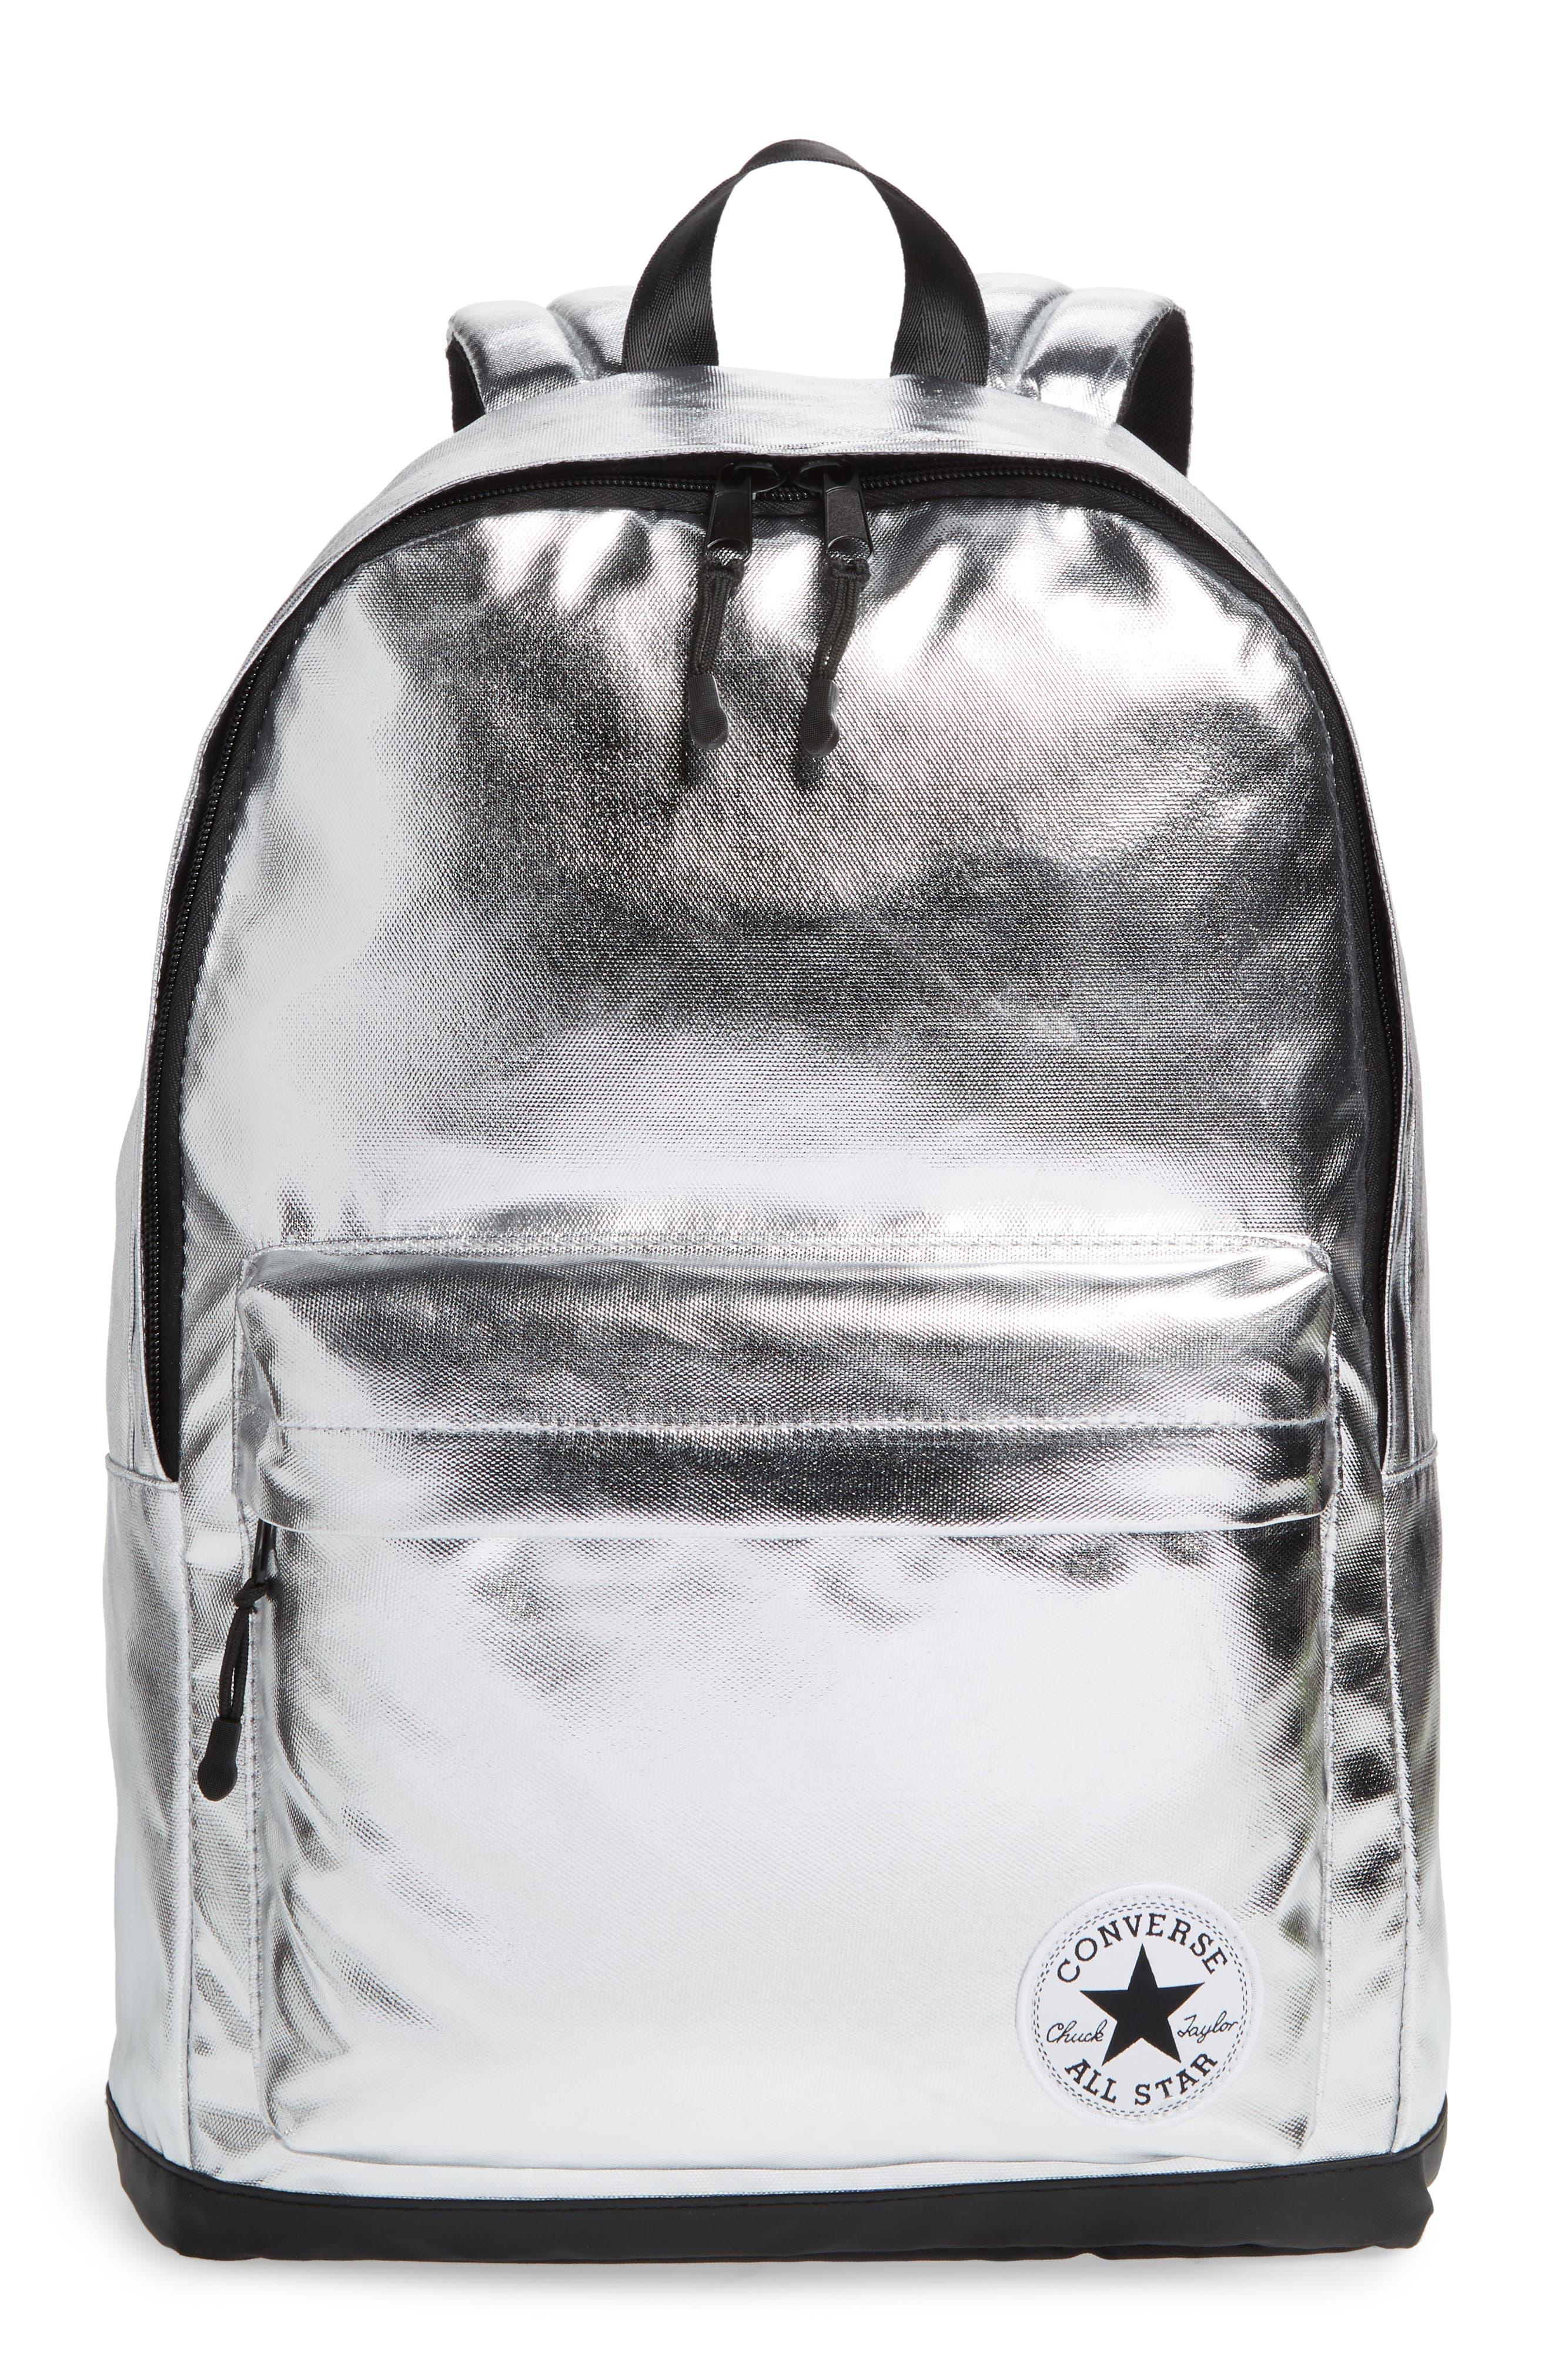 Boys Converse Metallic Backpack  Metallic